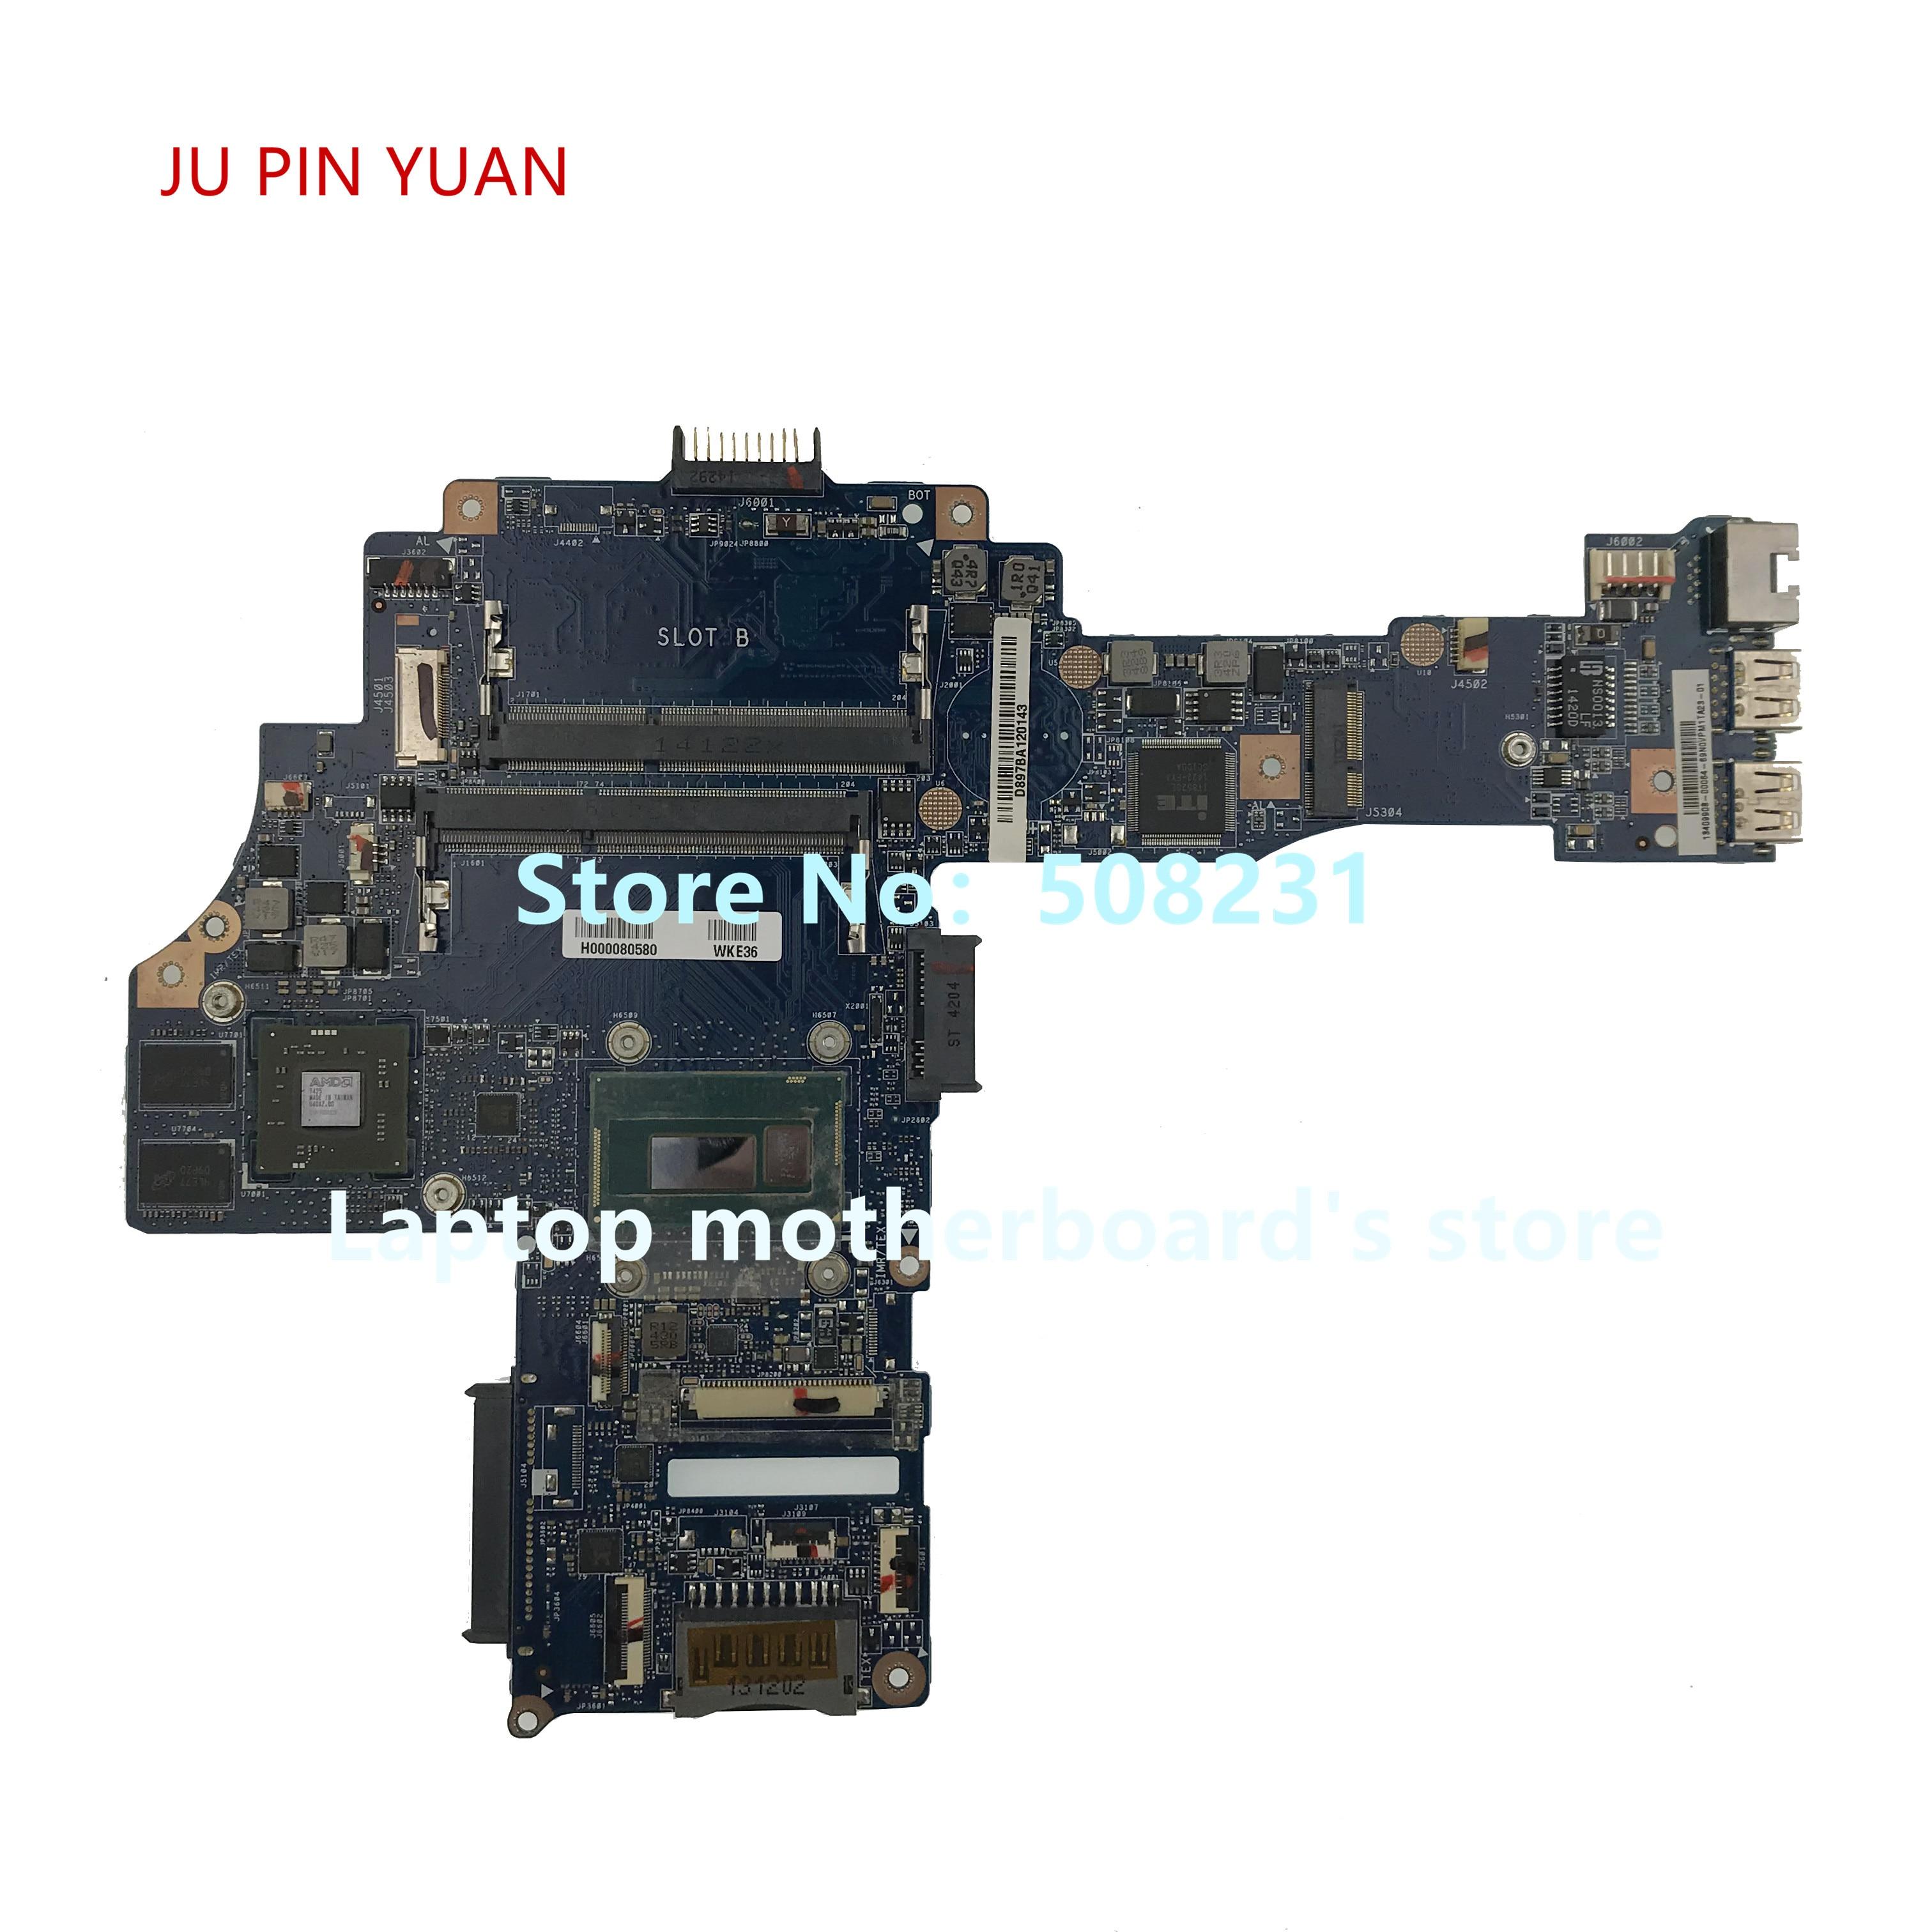 CA10SUG/CUG H000080580 69N0VPM1TA25-01 I5-4210U 20pin Placa Base Para Toshiba Satellite E40-B C40-B...